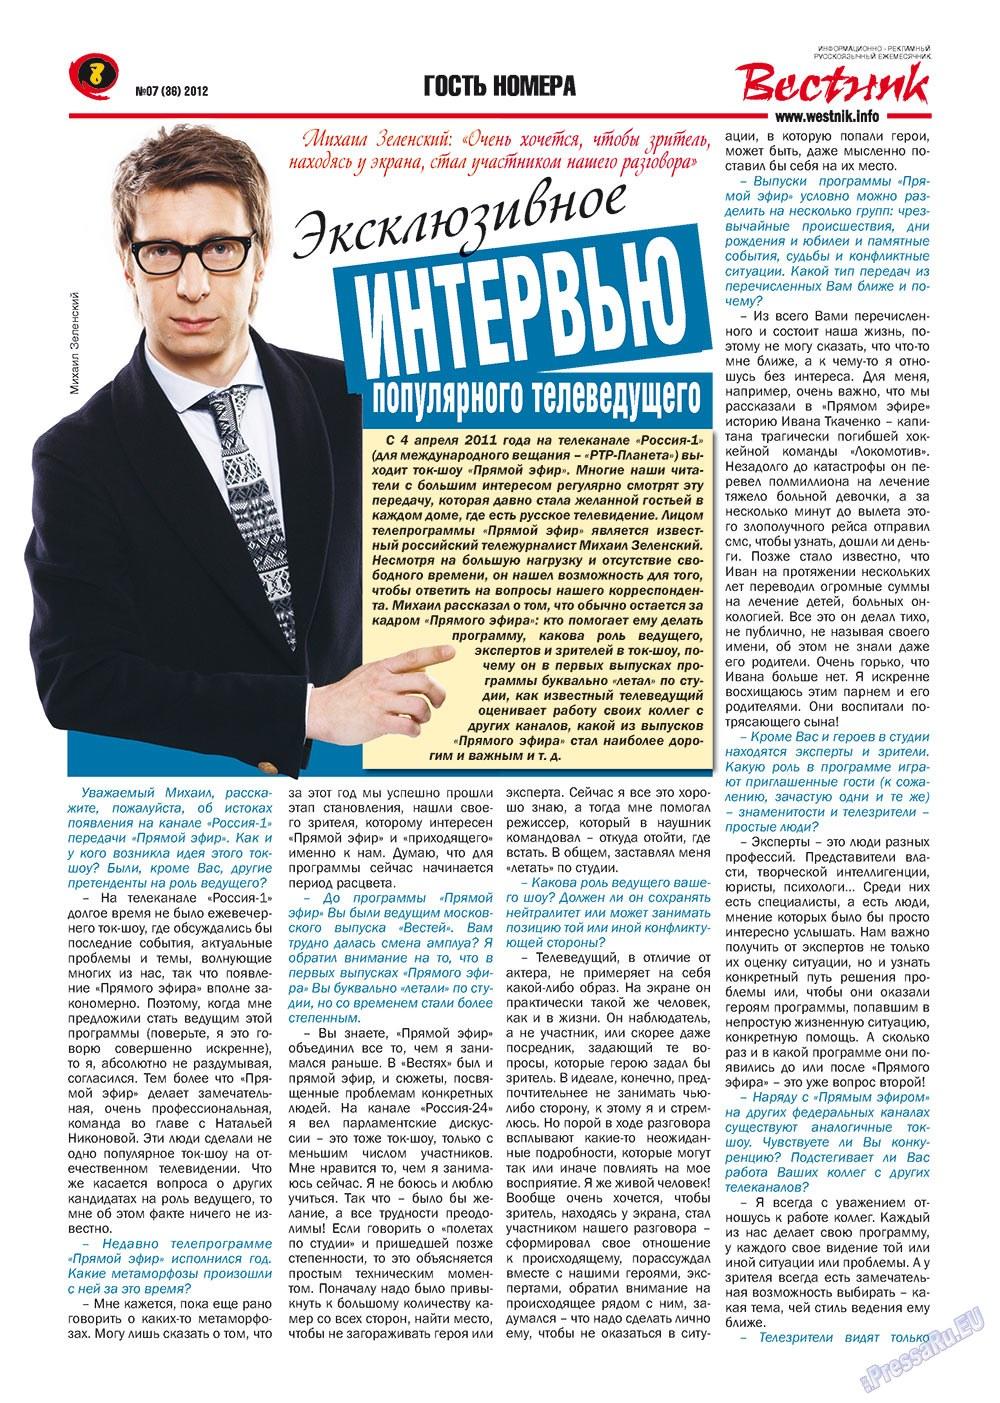 Вестник-info (журнал). 2012 год, номер 7, стр. 8